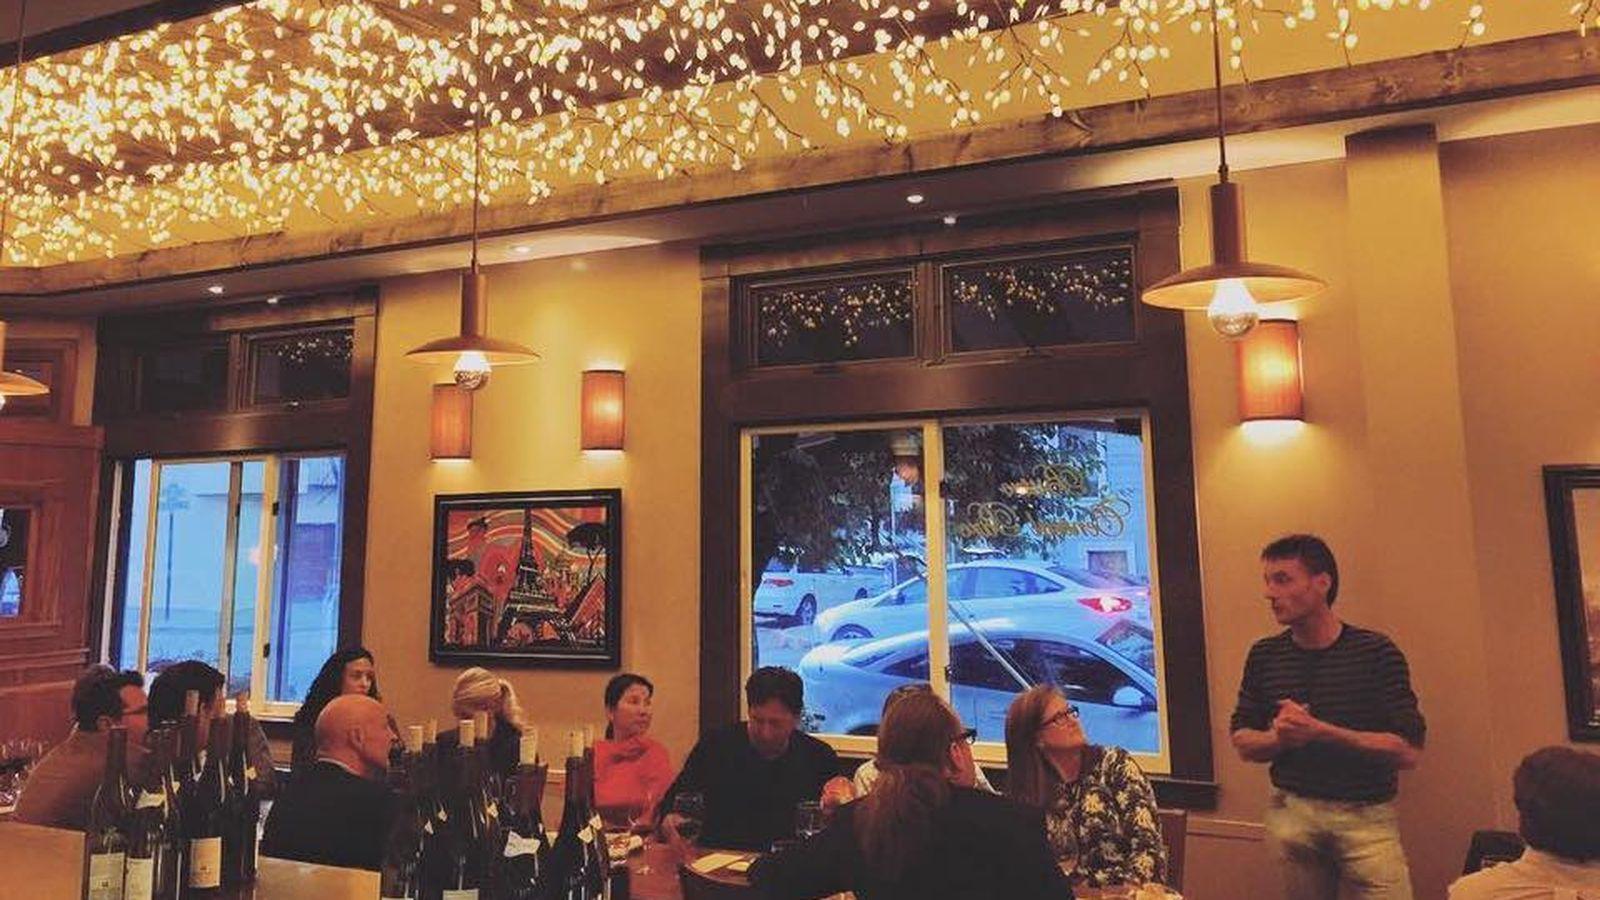 bedste dating restaurant san francisco speed dating stoke på trent 2016